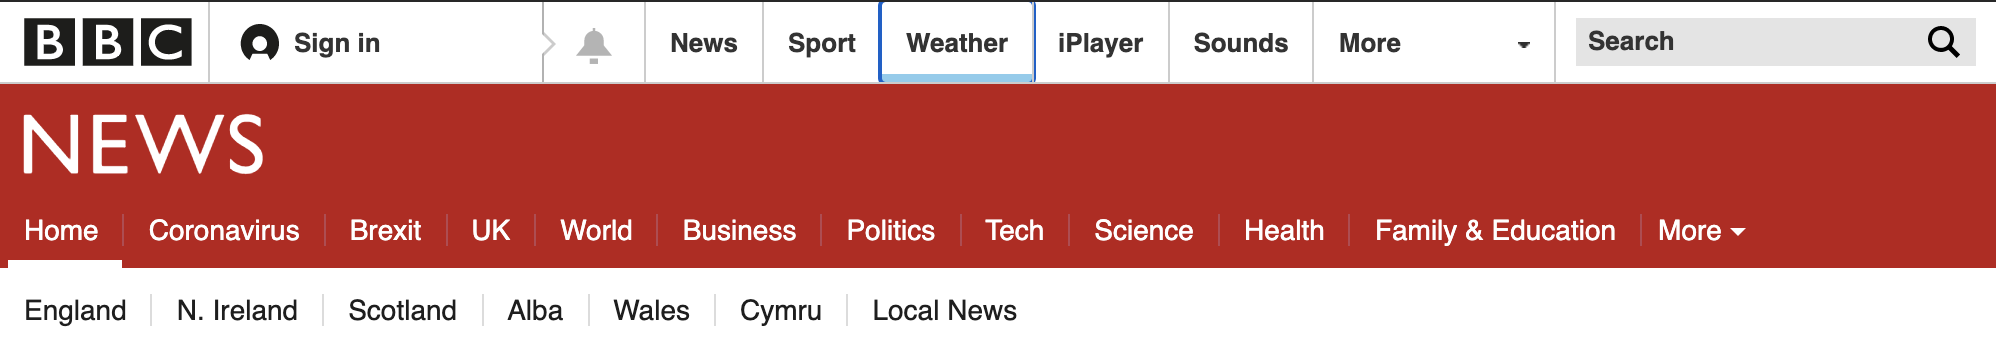 BBC News website header showing highlighted navigation element